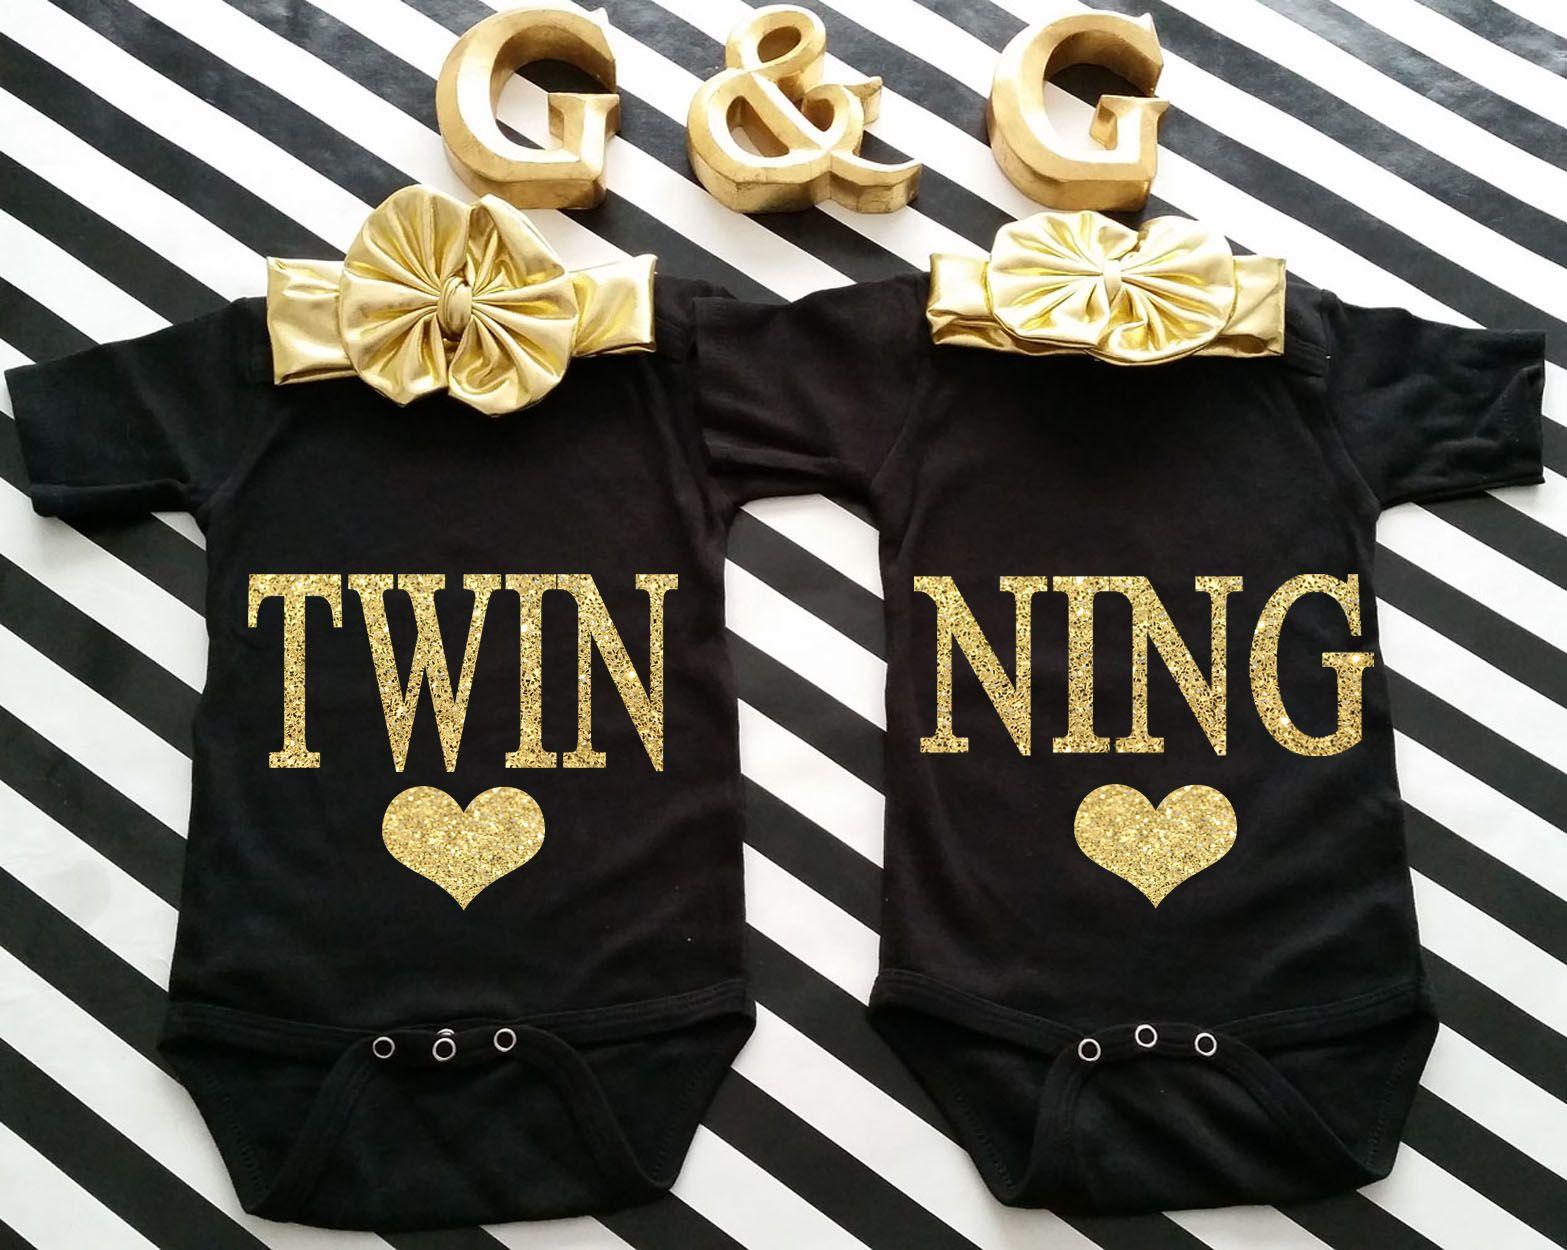 Black t shirt for babies - Black And Gold Glitter Twinning Boy And Girl Matching Shirts